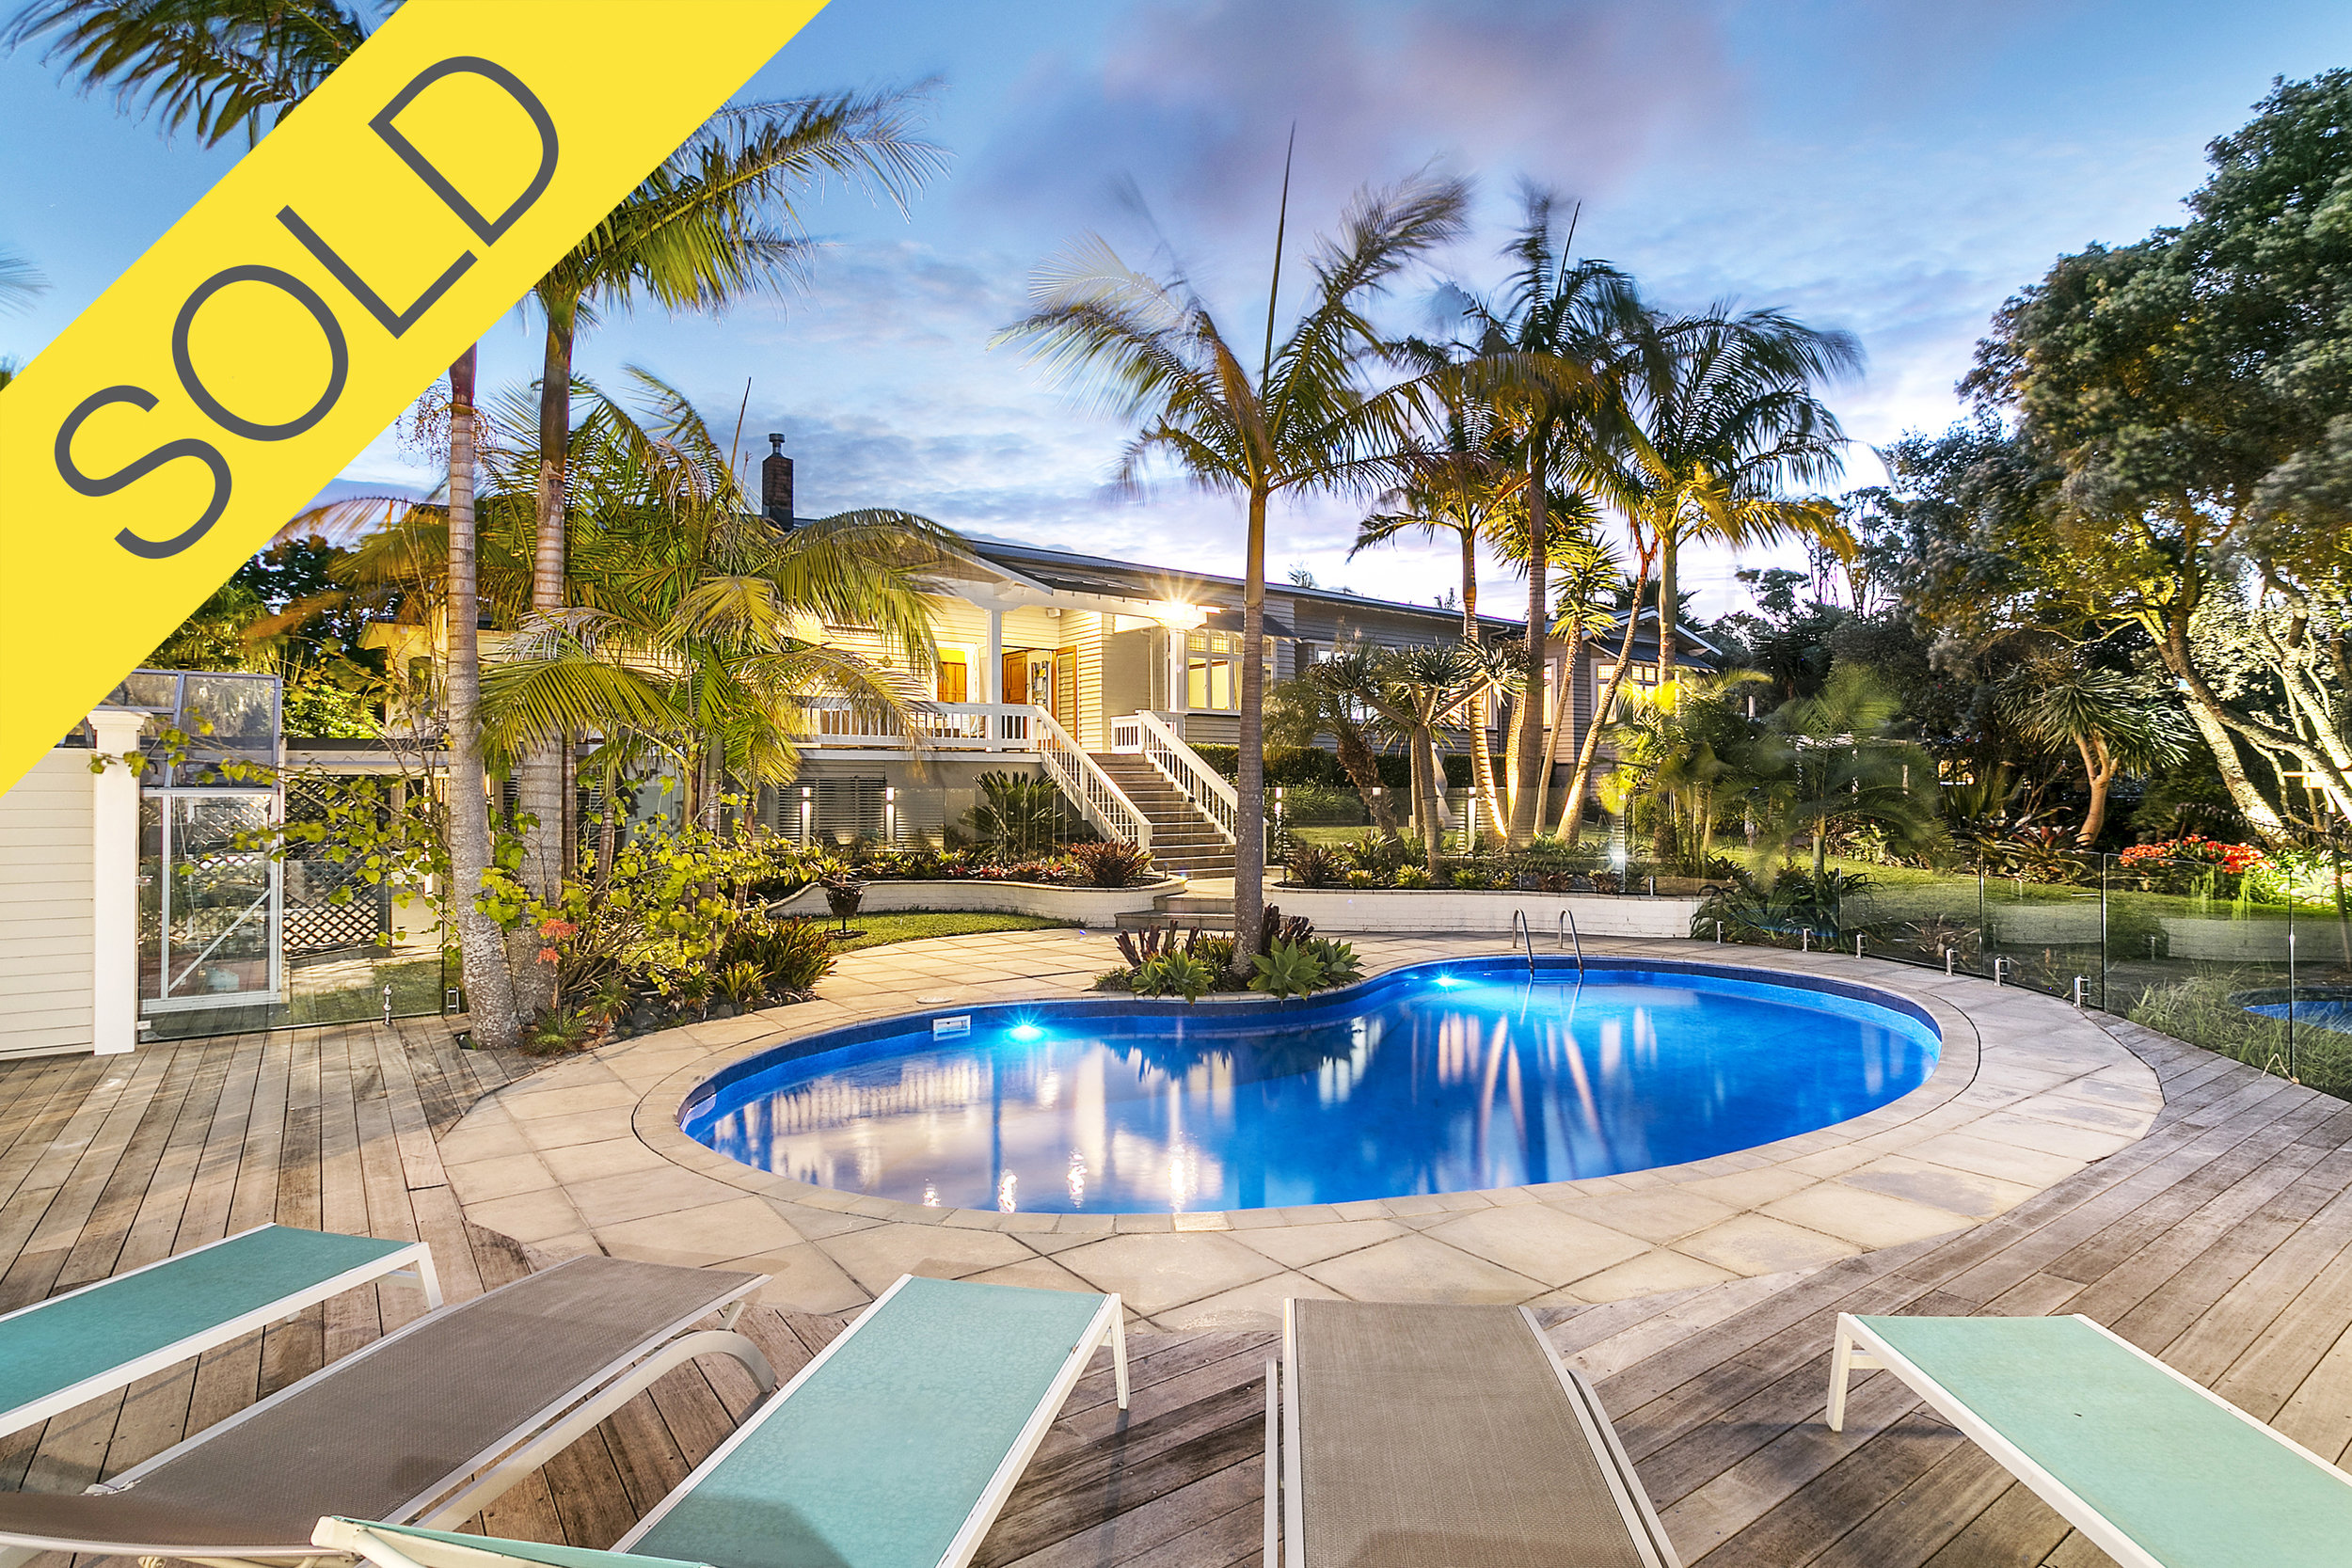 50 Carlton Street, Hillsborough, Auckland - SOLD MARCH 20185 Beds | 3 Baths | 7 Parking